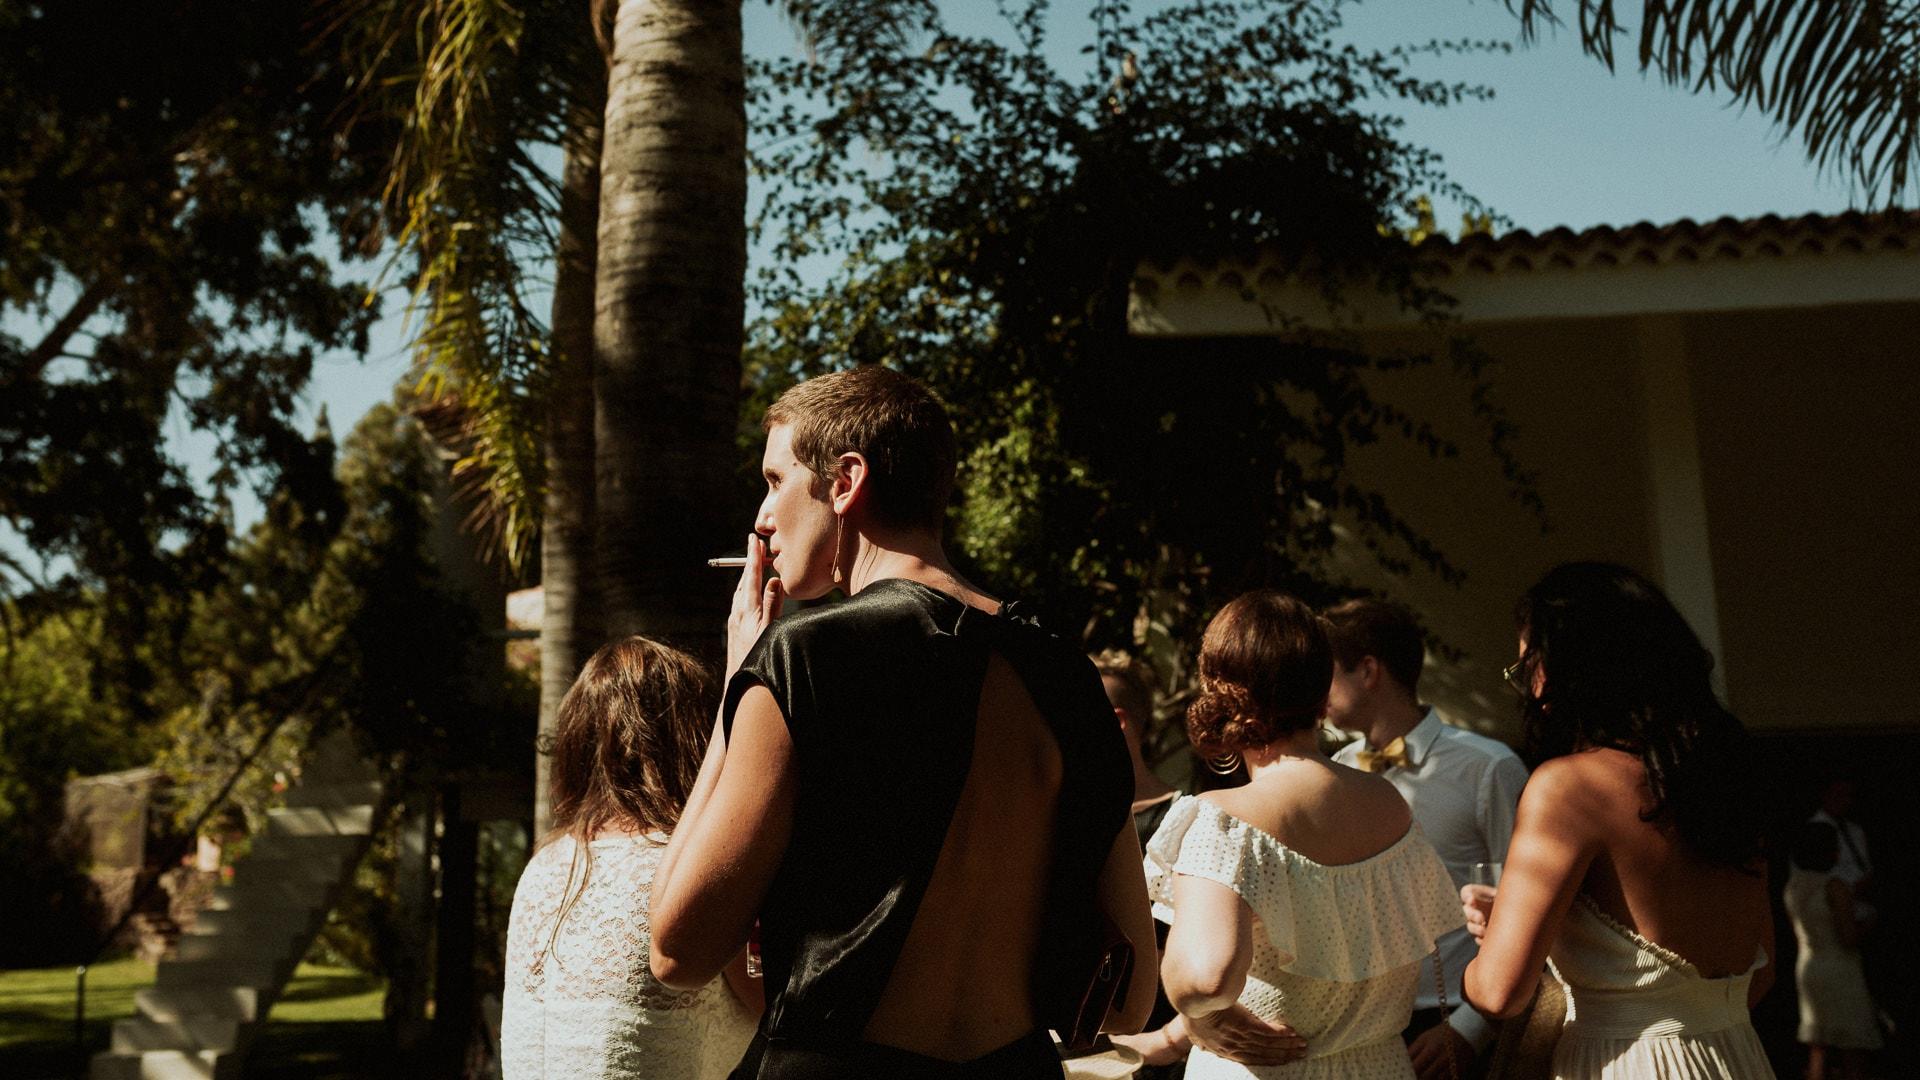 Grancanaria Samesex Lgbtq Wedding Photographer Spain 0015